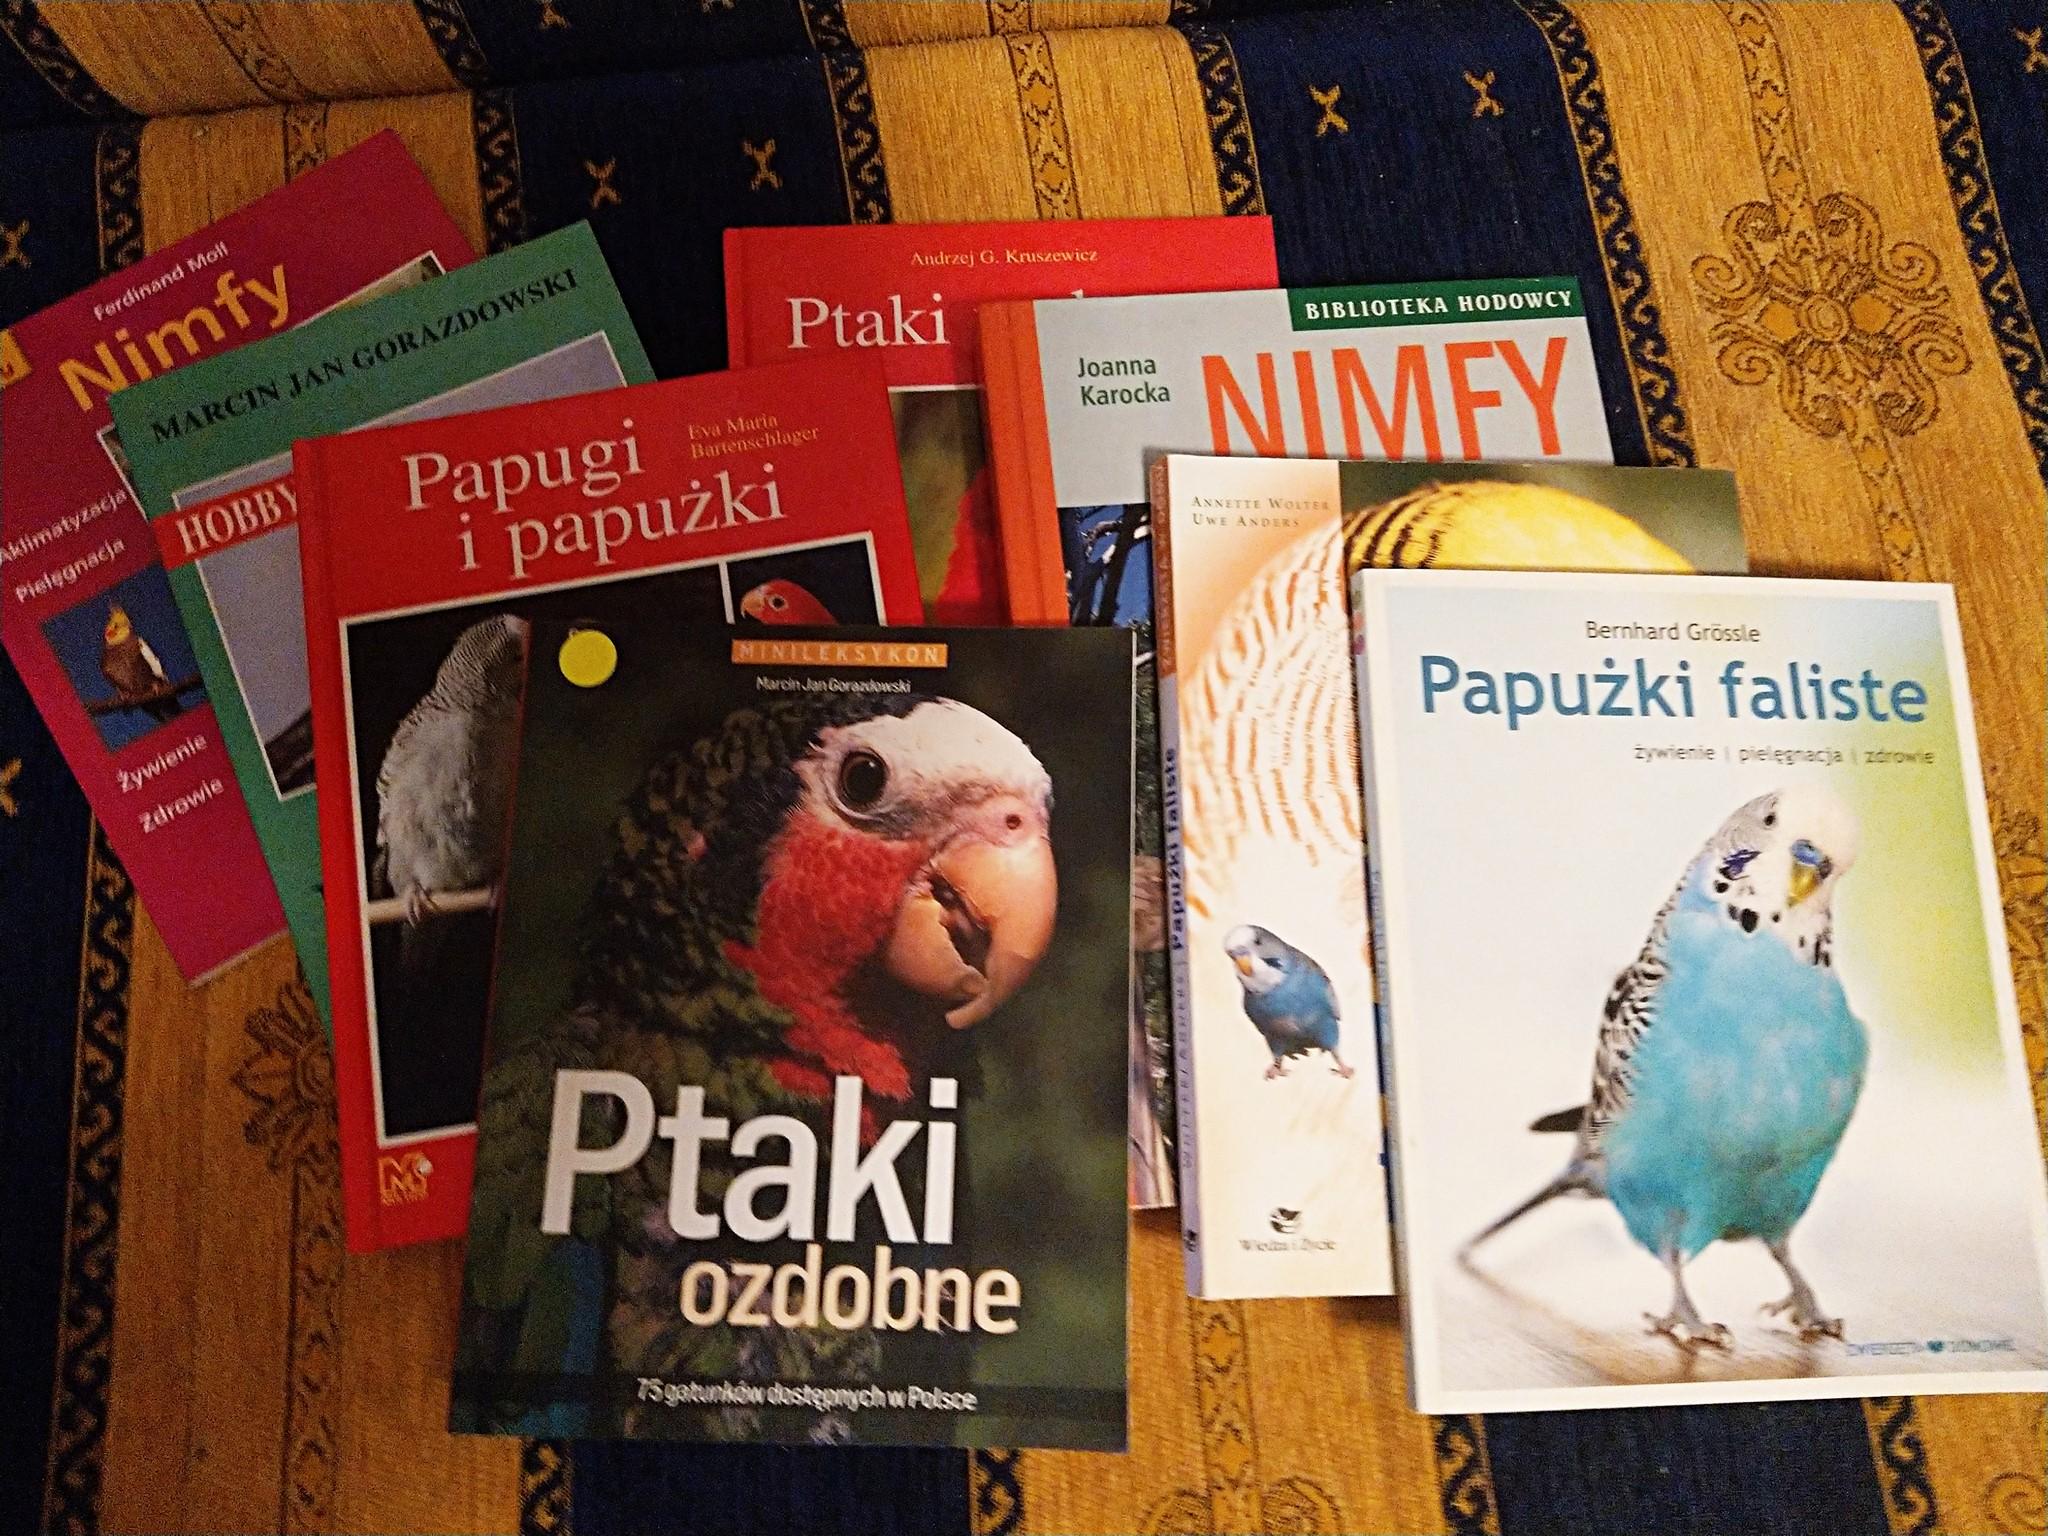 Książki o nimfach